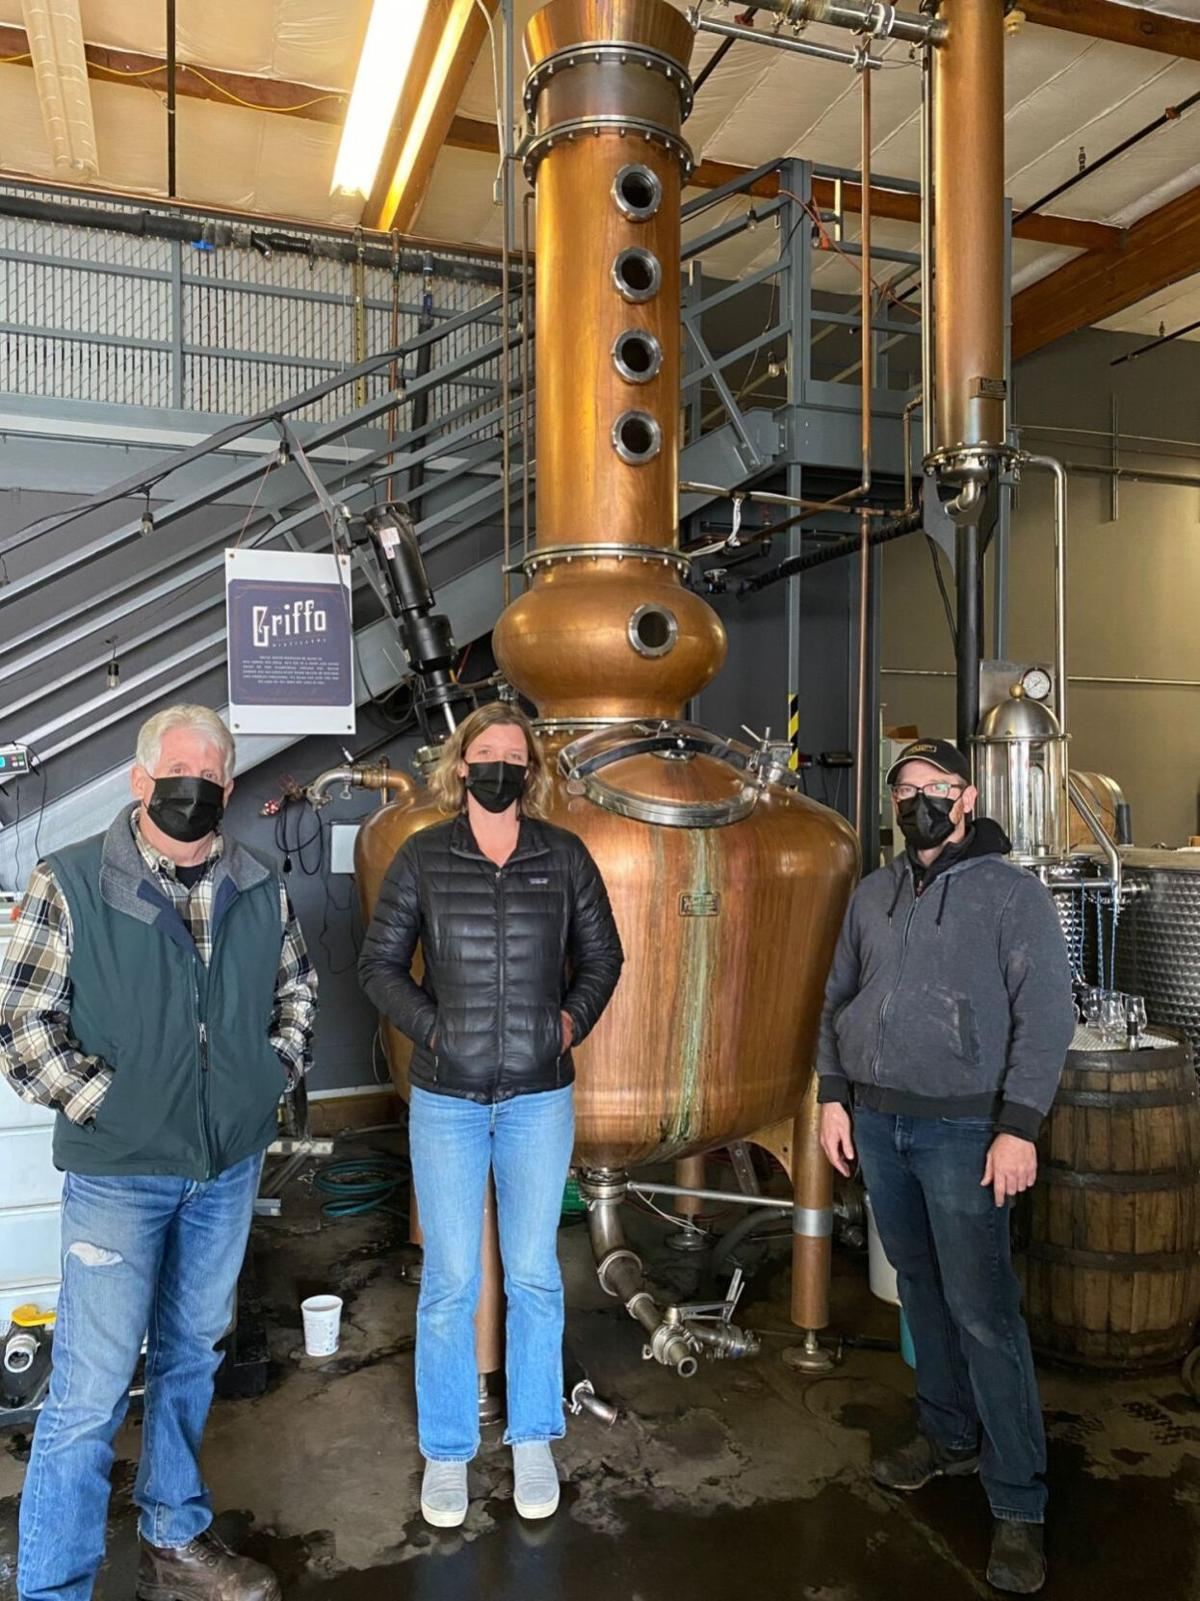 Tom Eddy, Jenny Griffo, Jason Gerard at distillery